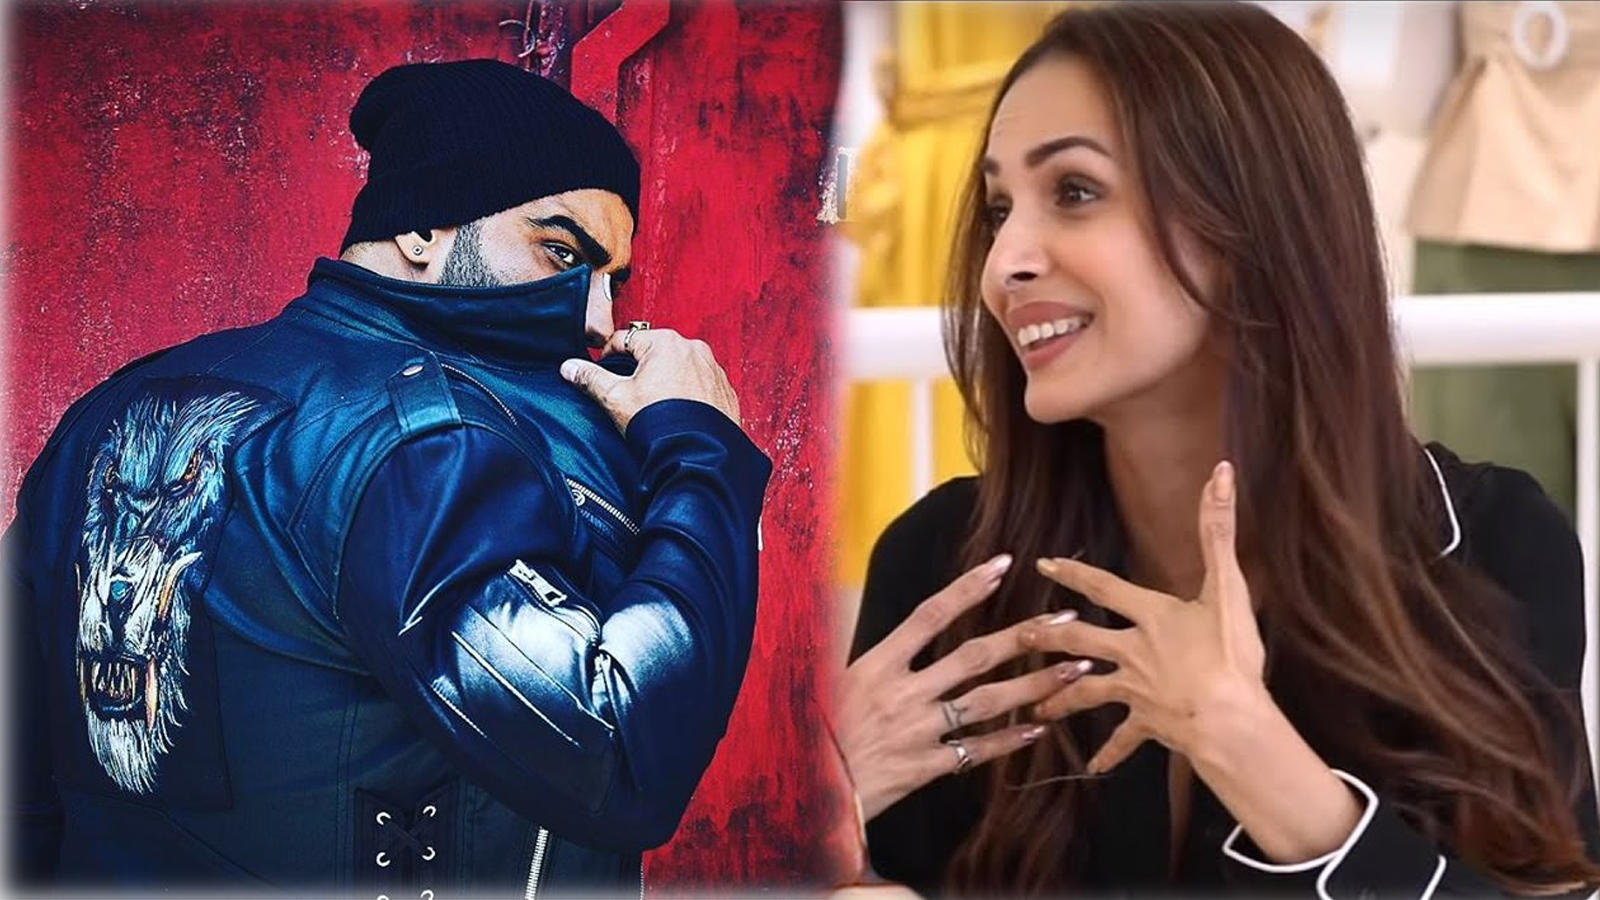 arjun-kapoor-impresses-rumoured-girlfriend-malaika-arora-once-again